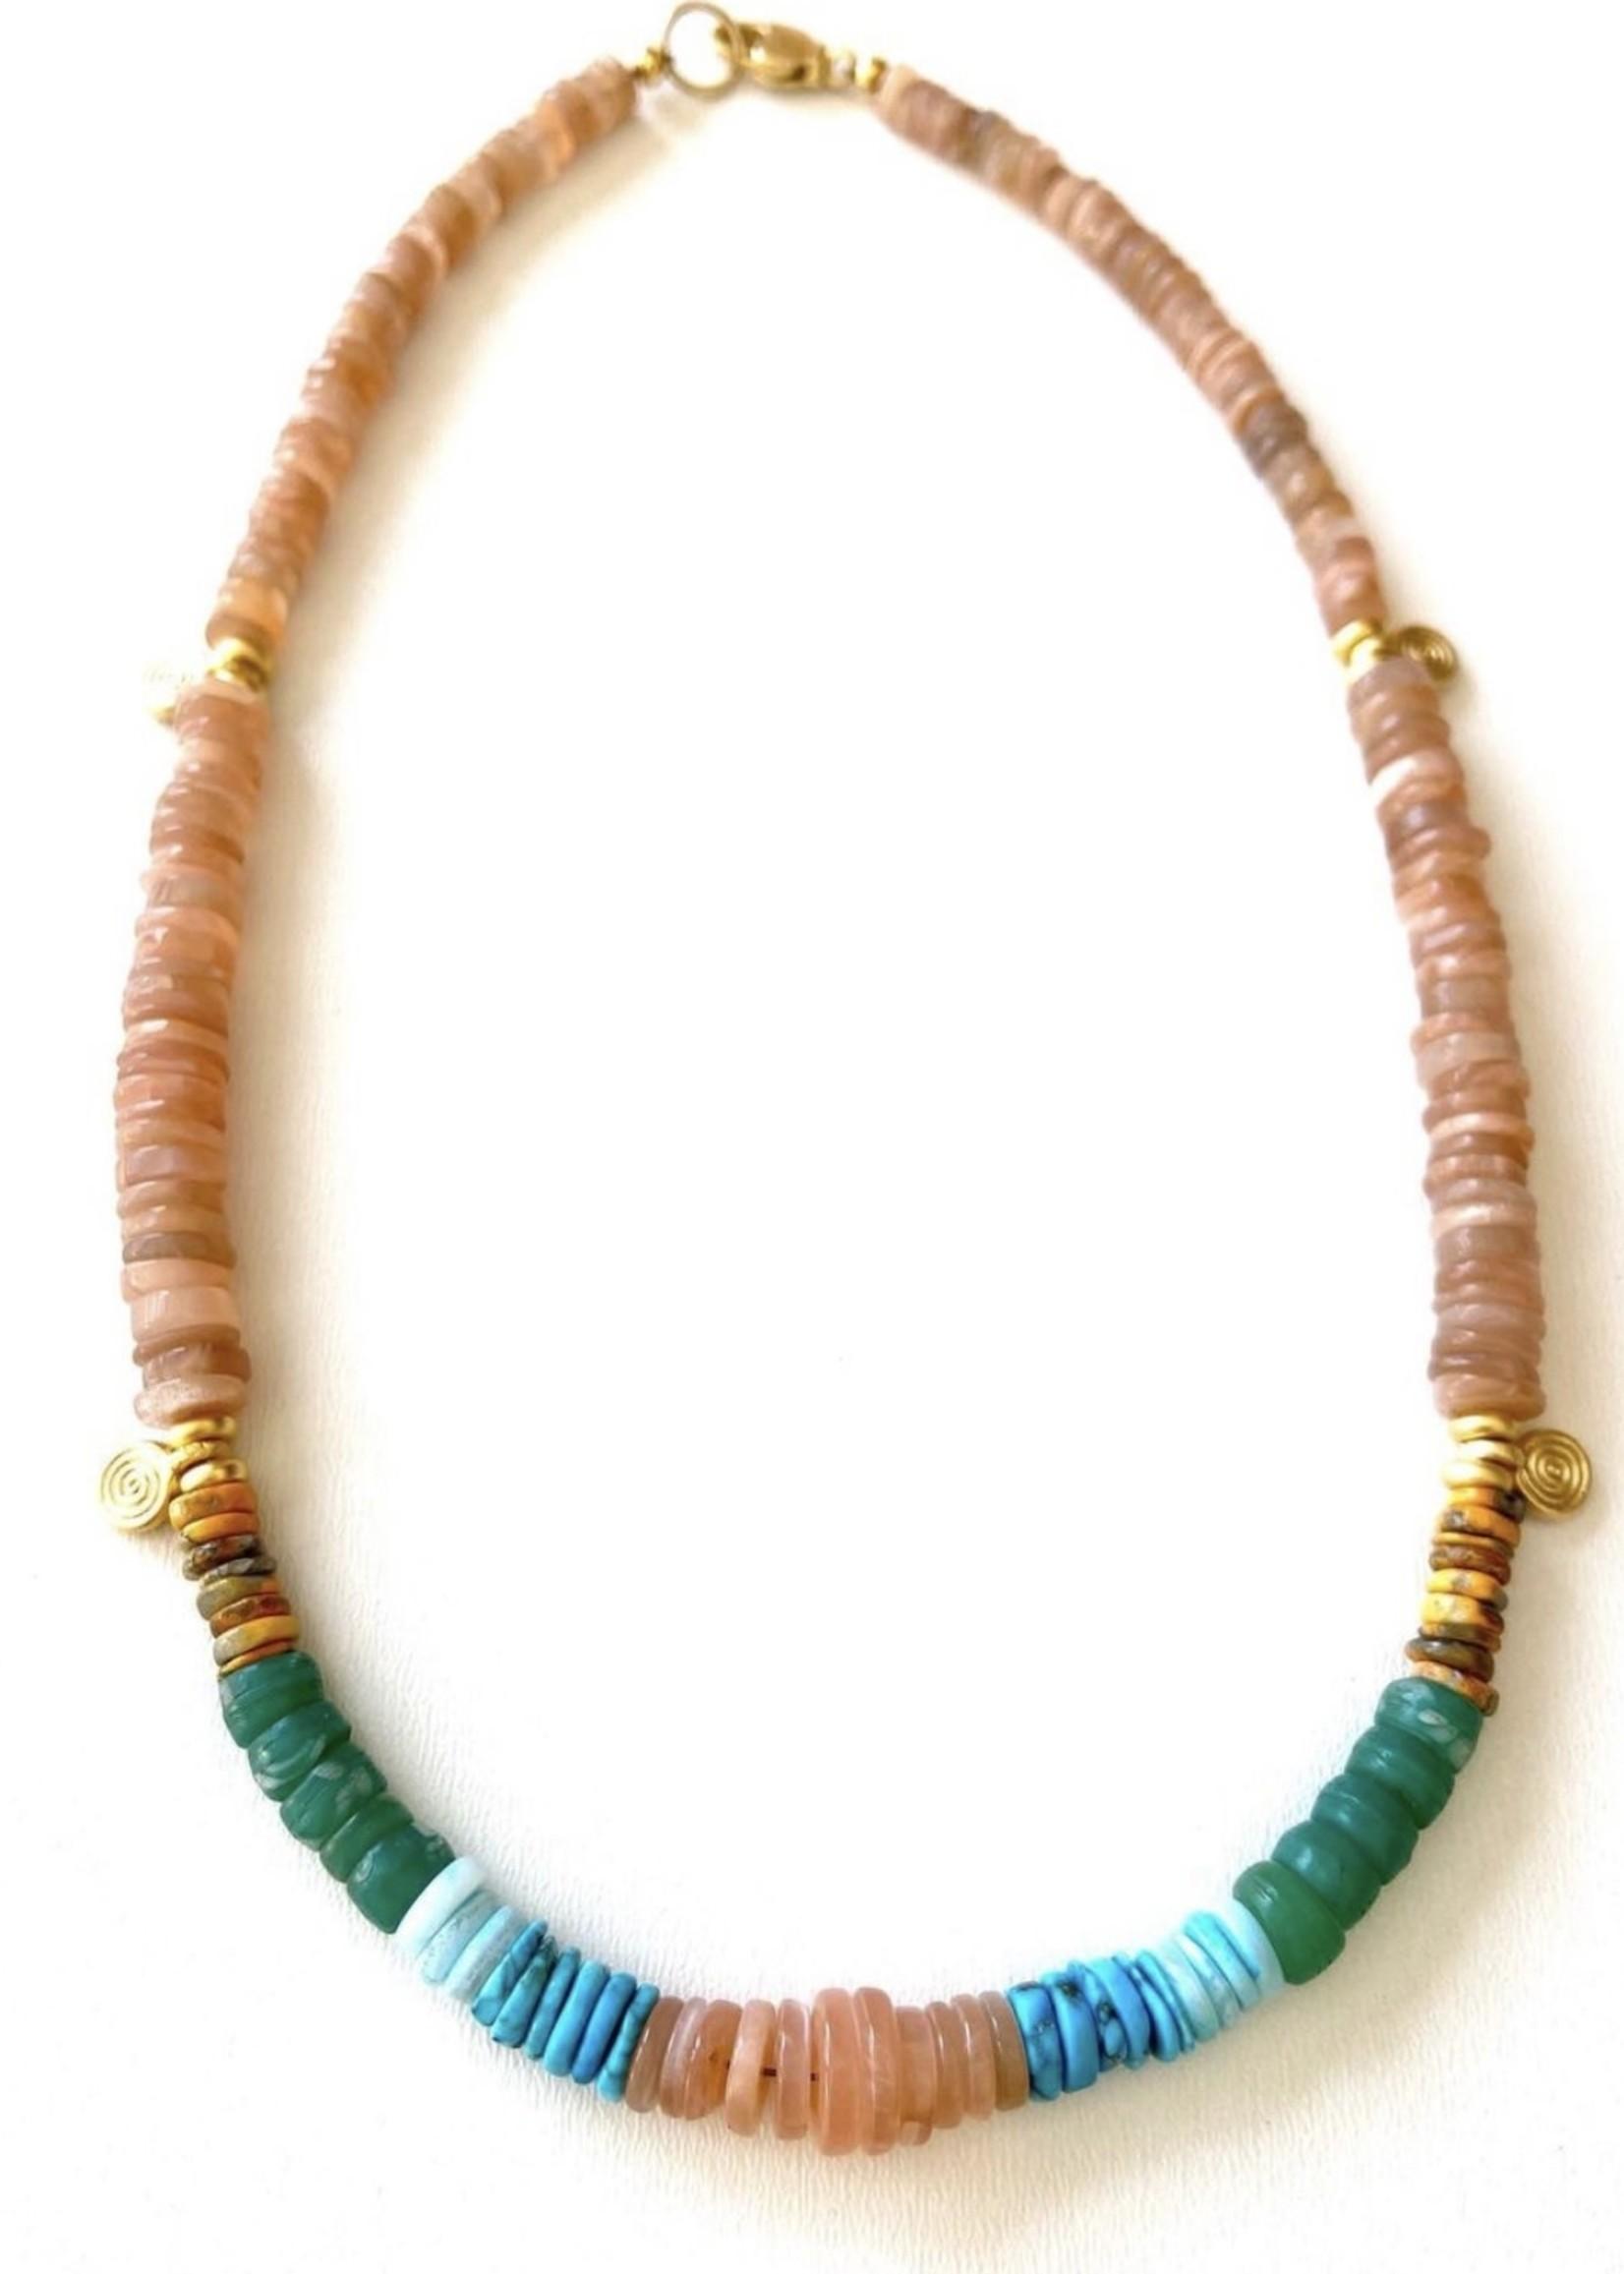 California summer necklace